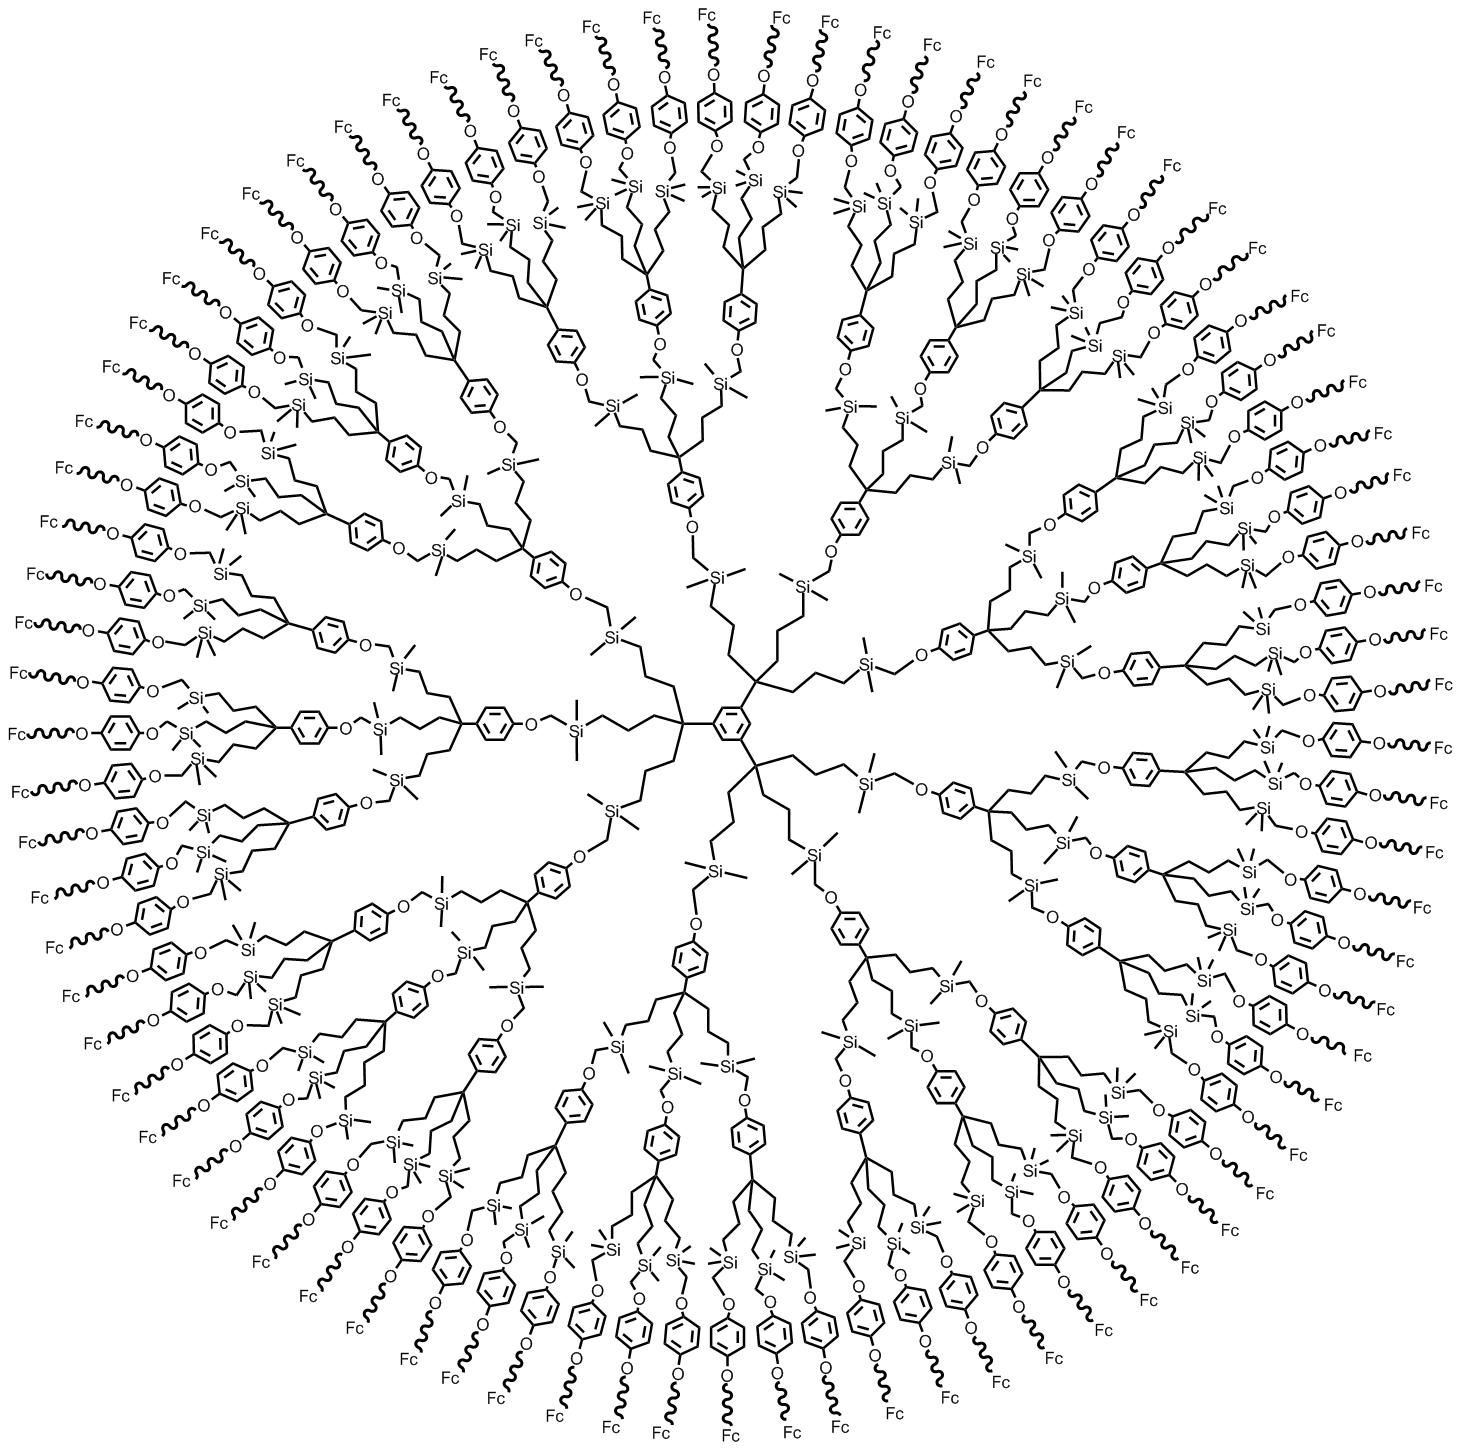 1462x1450 Chemistry Draw Ge Universal Remote 24991 Codes Swotnalysis